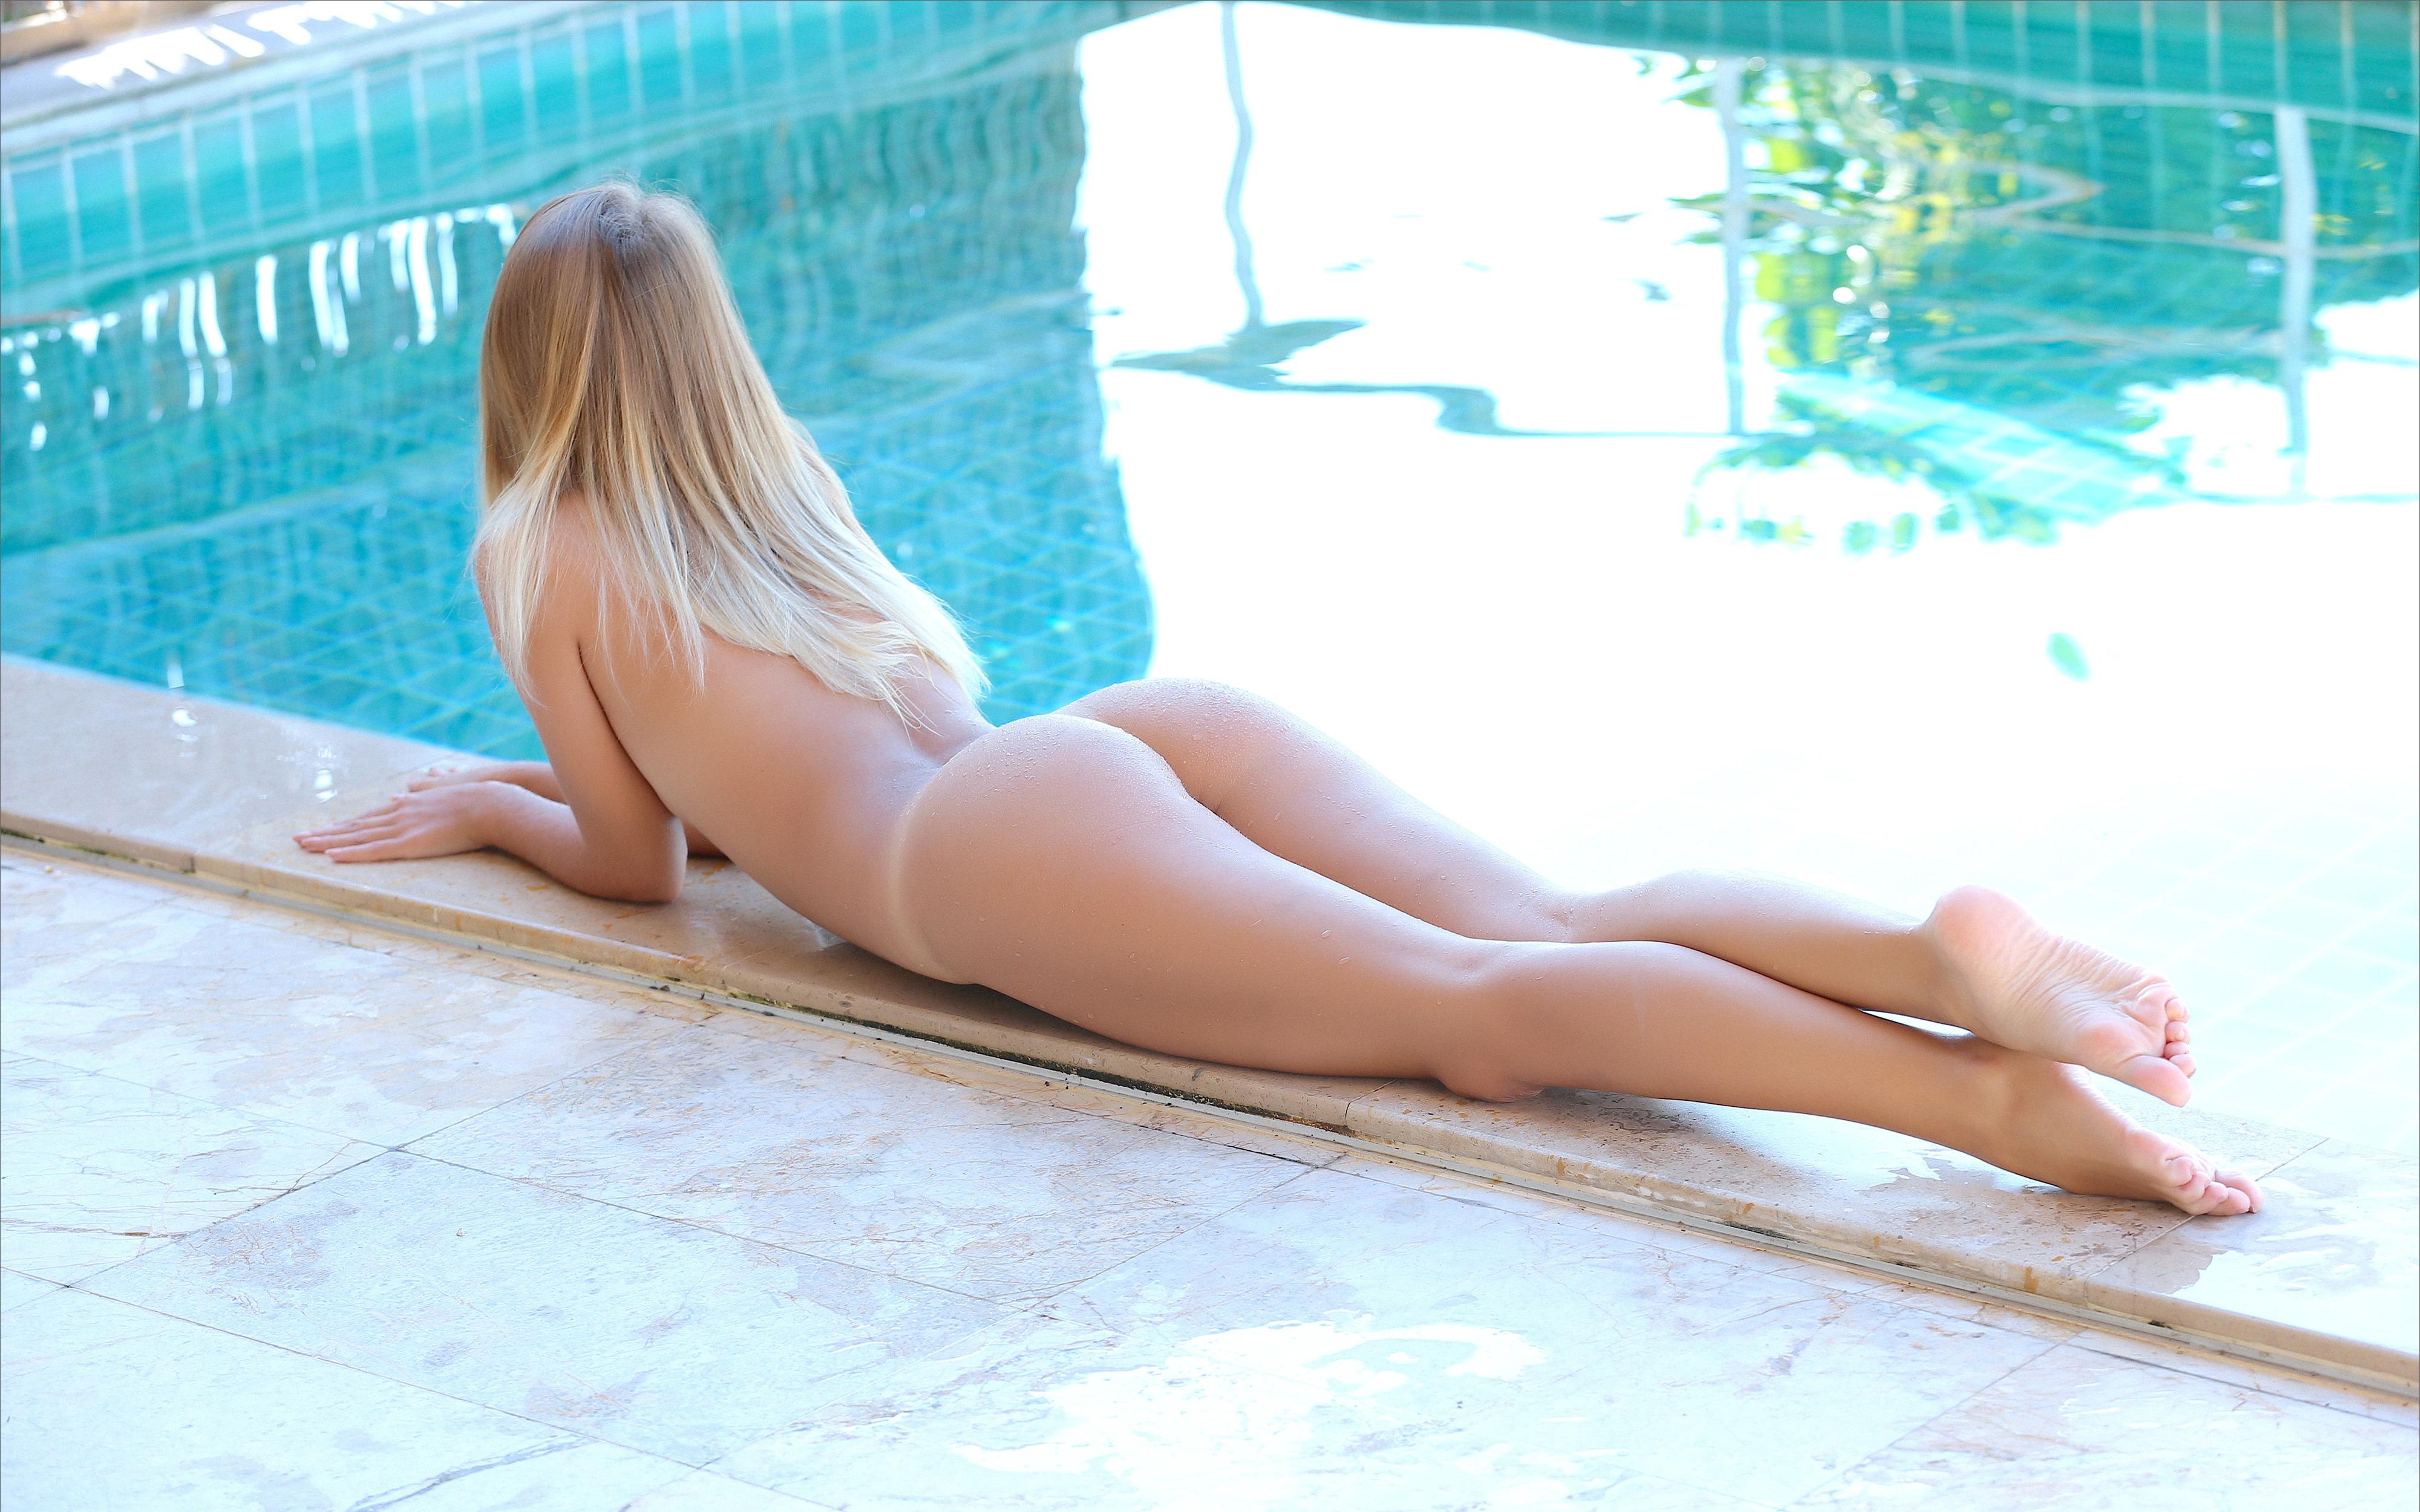 Wallpaper Aida, Linda, Sexy Girl, Adult Model, Nude, Naked -7618